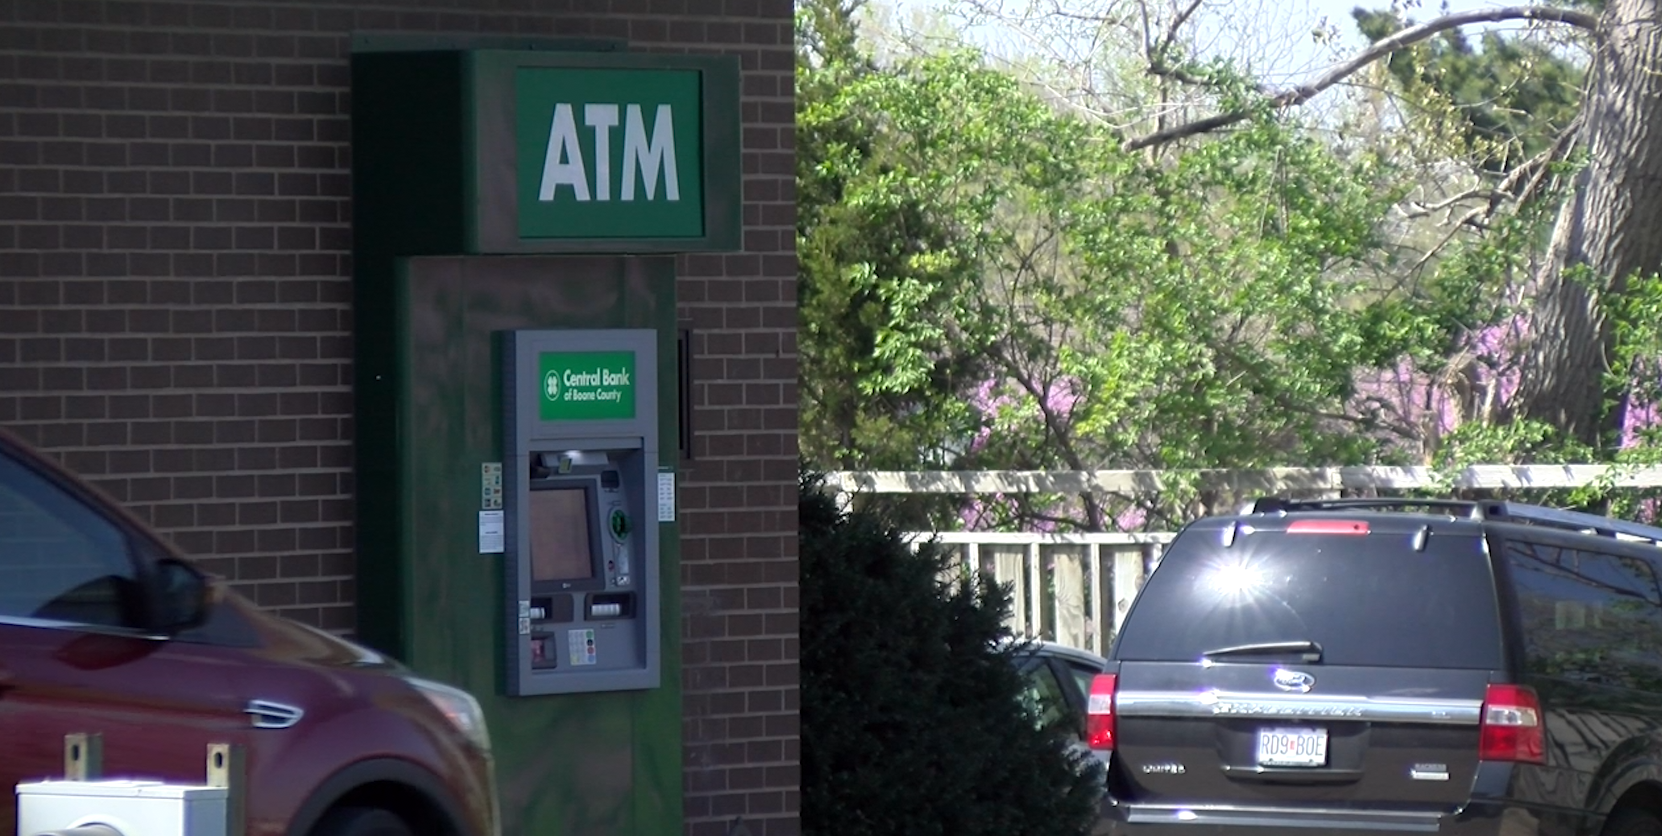 Central Bank ATM